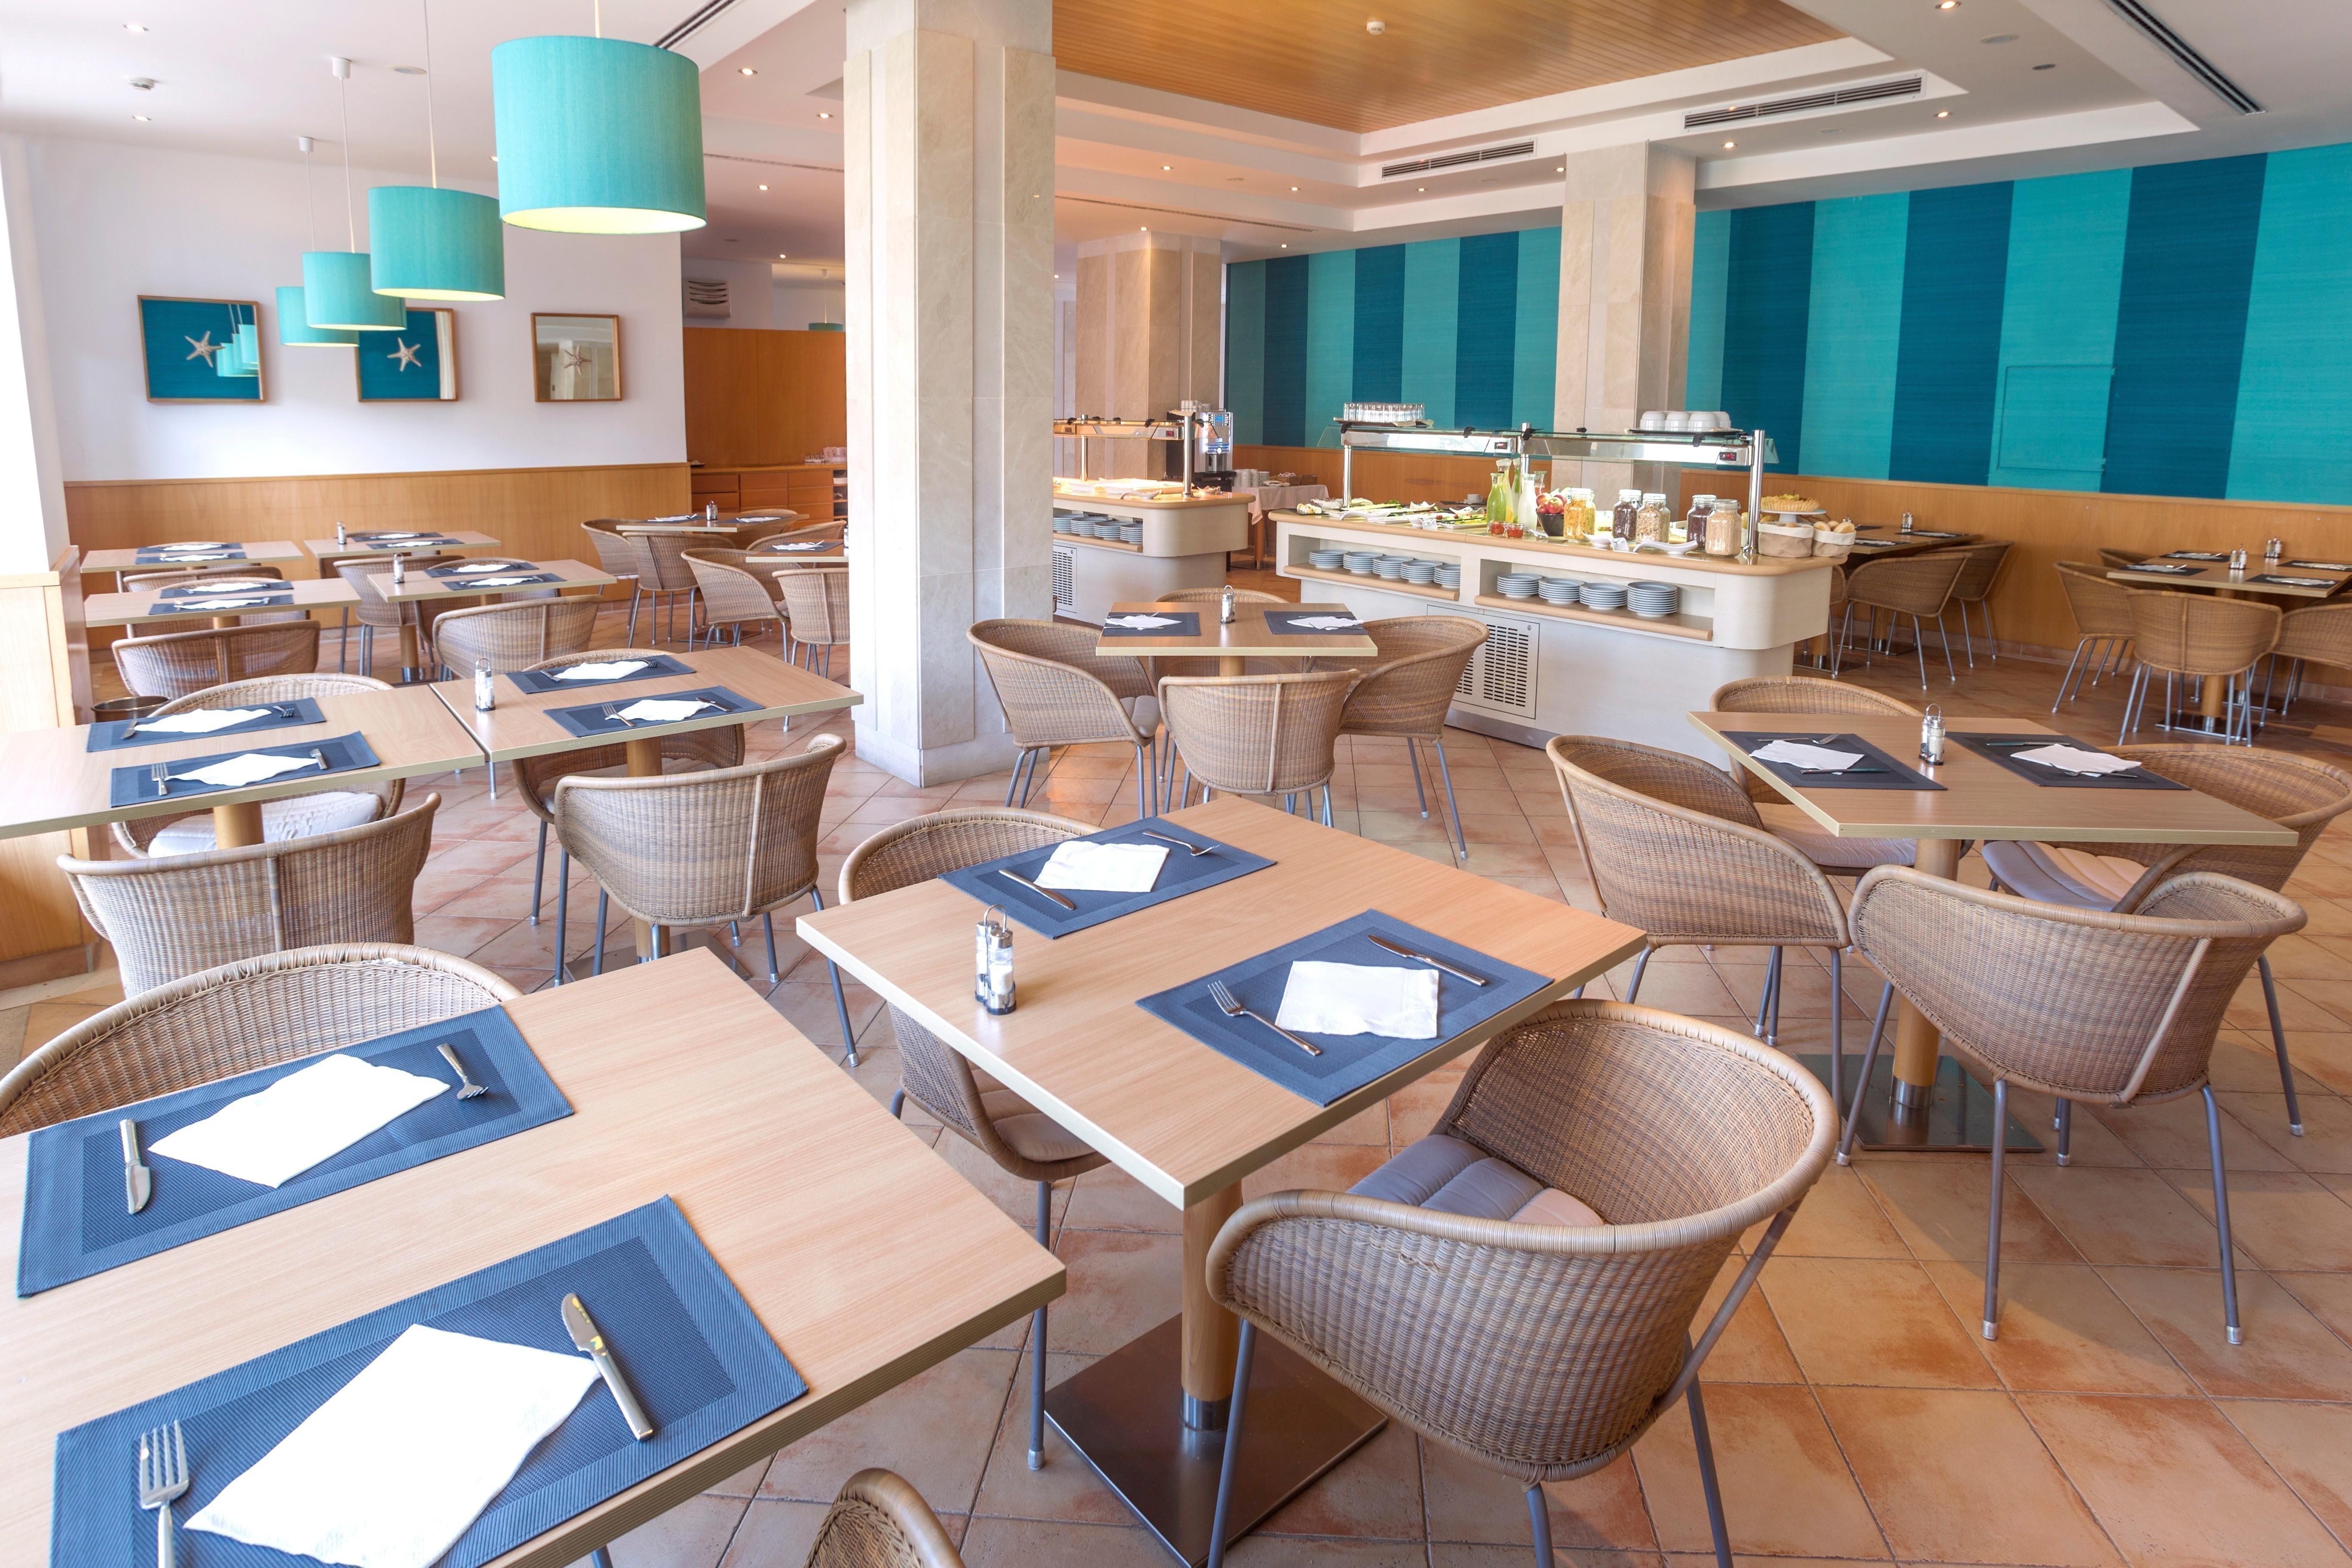 hotels/hotel_5/image_6.jpg